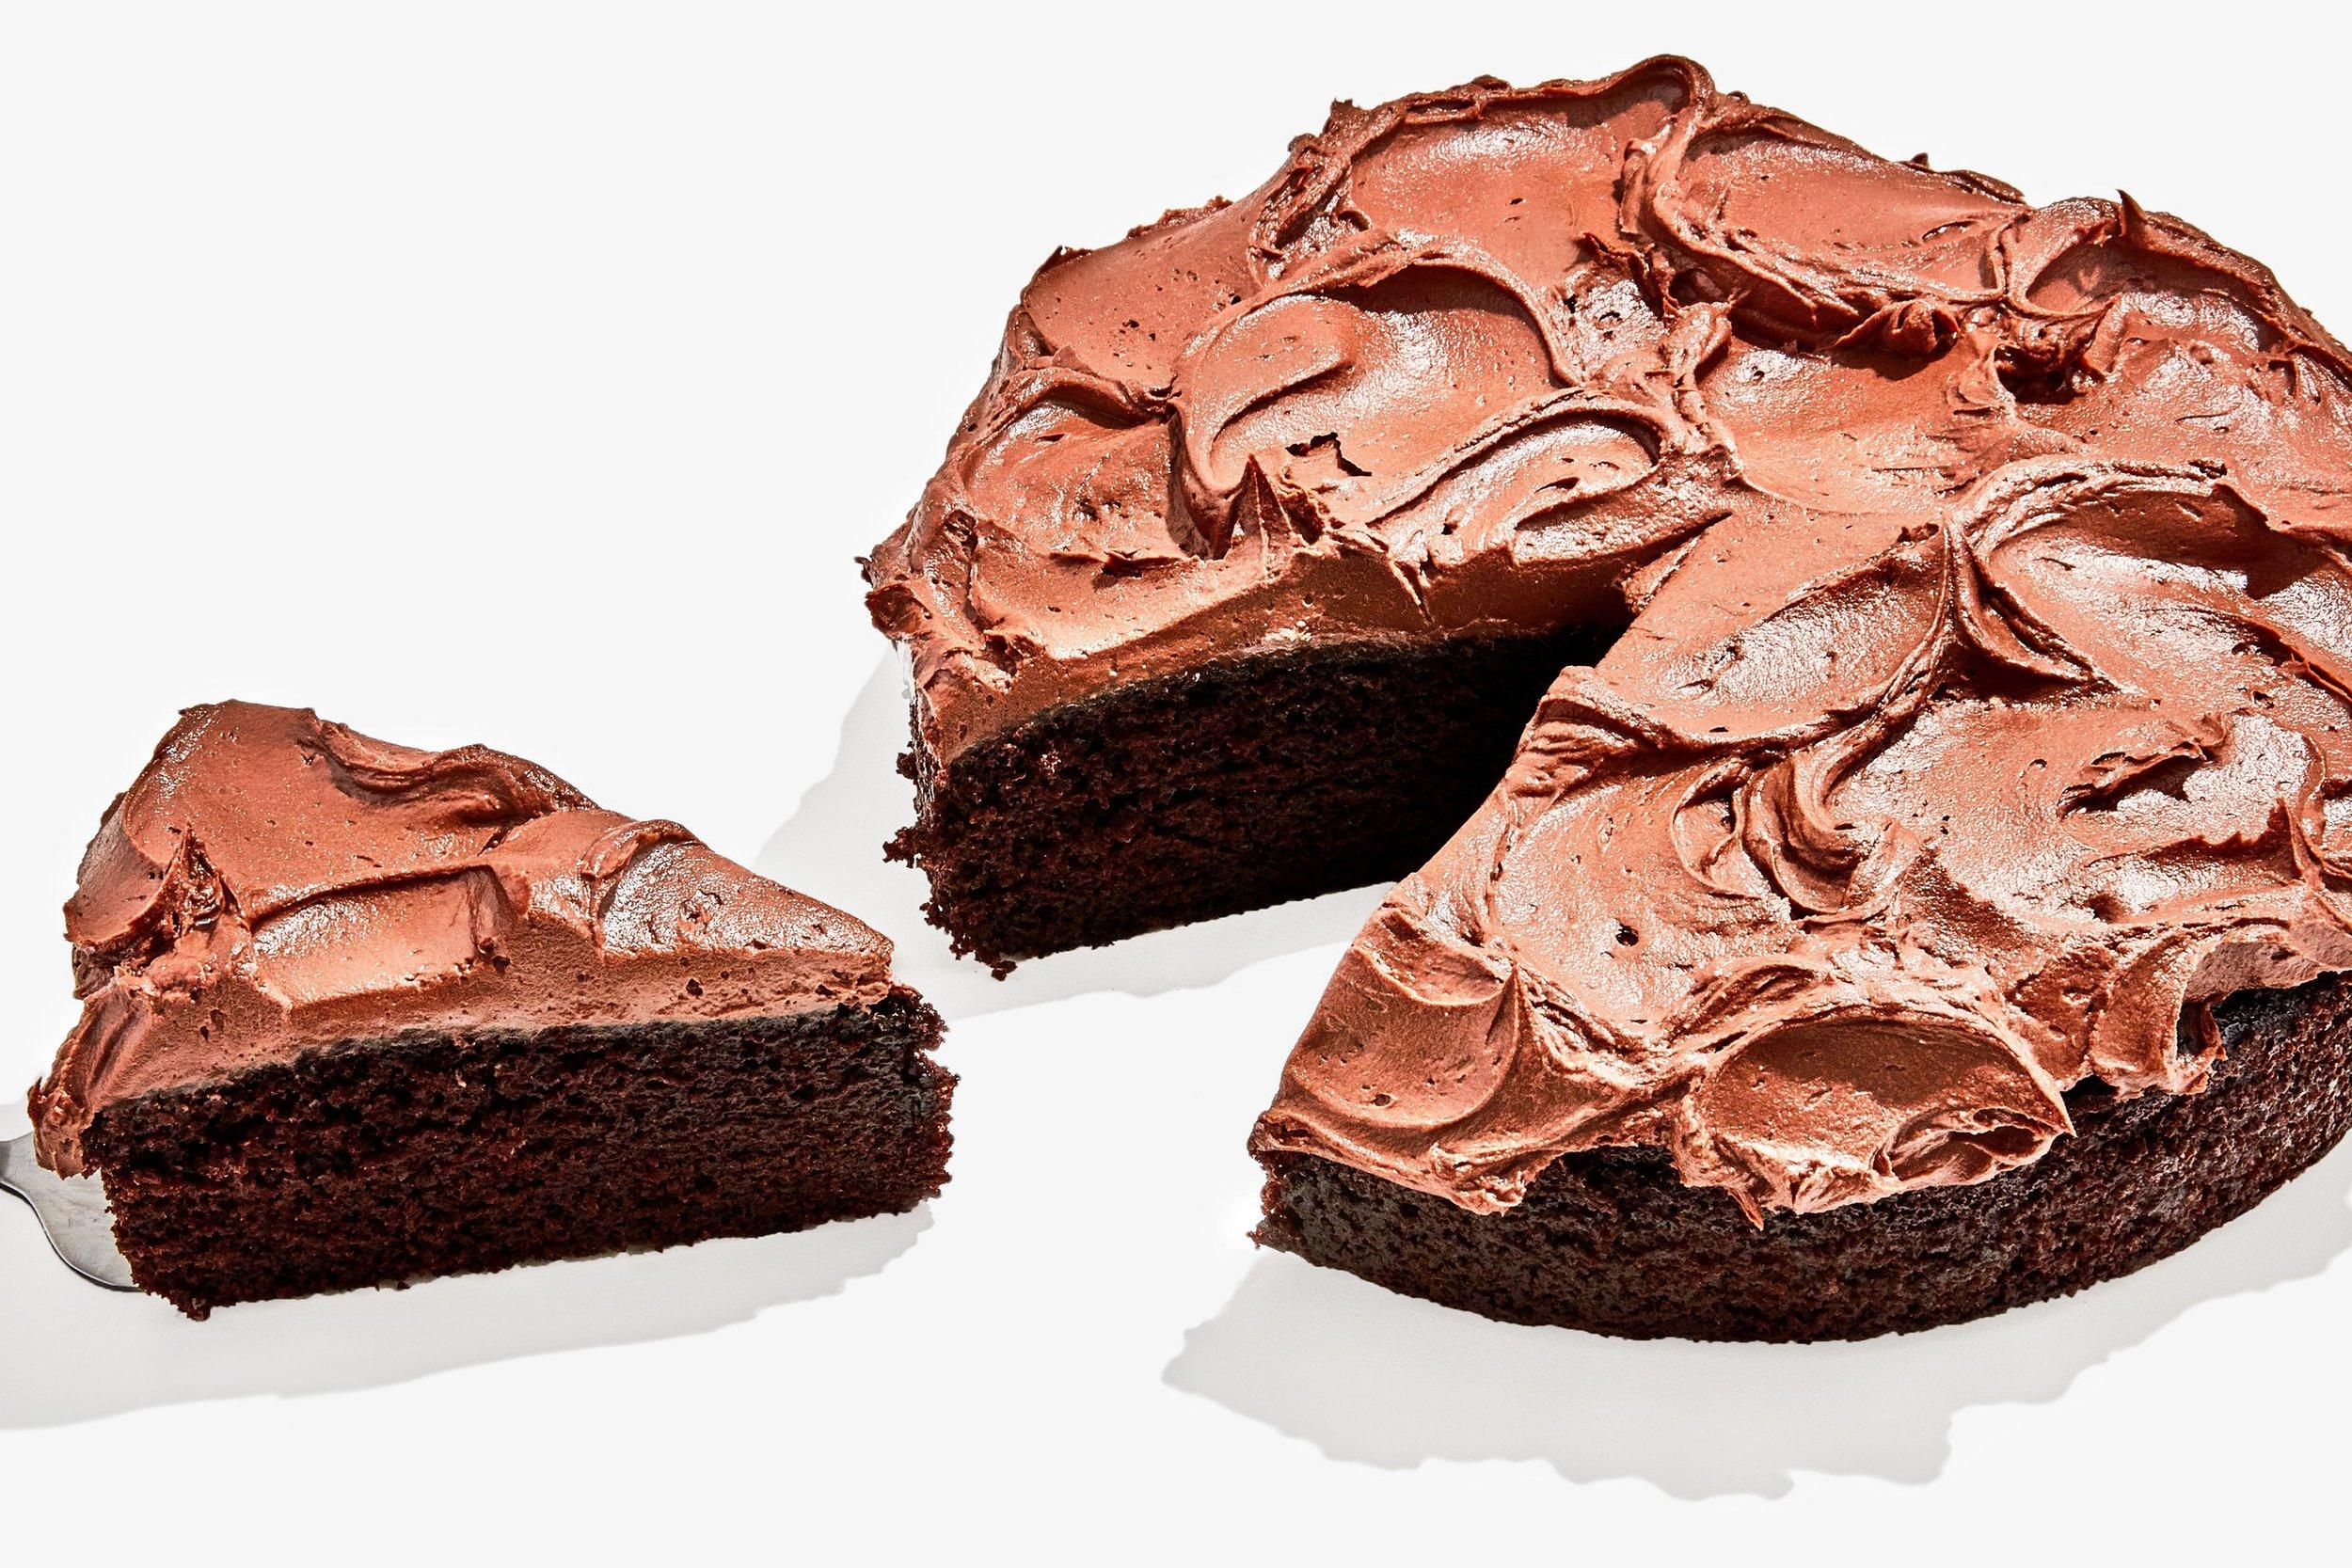 Basically-Chocolate-Cake-01-Light-Shadow copy (1).jpg